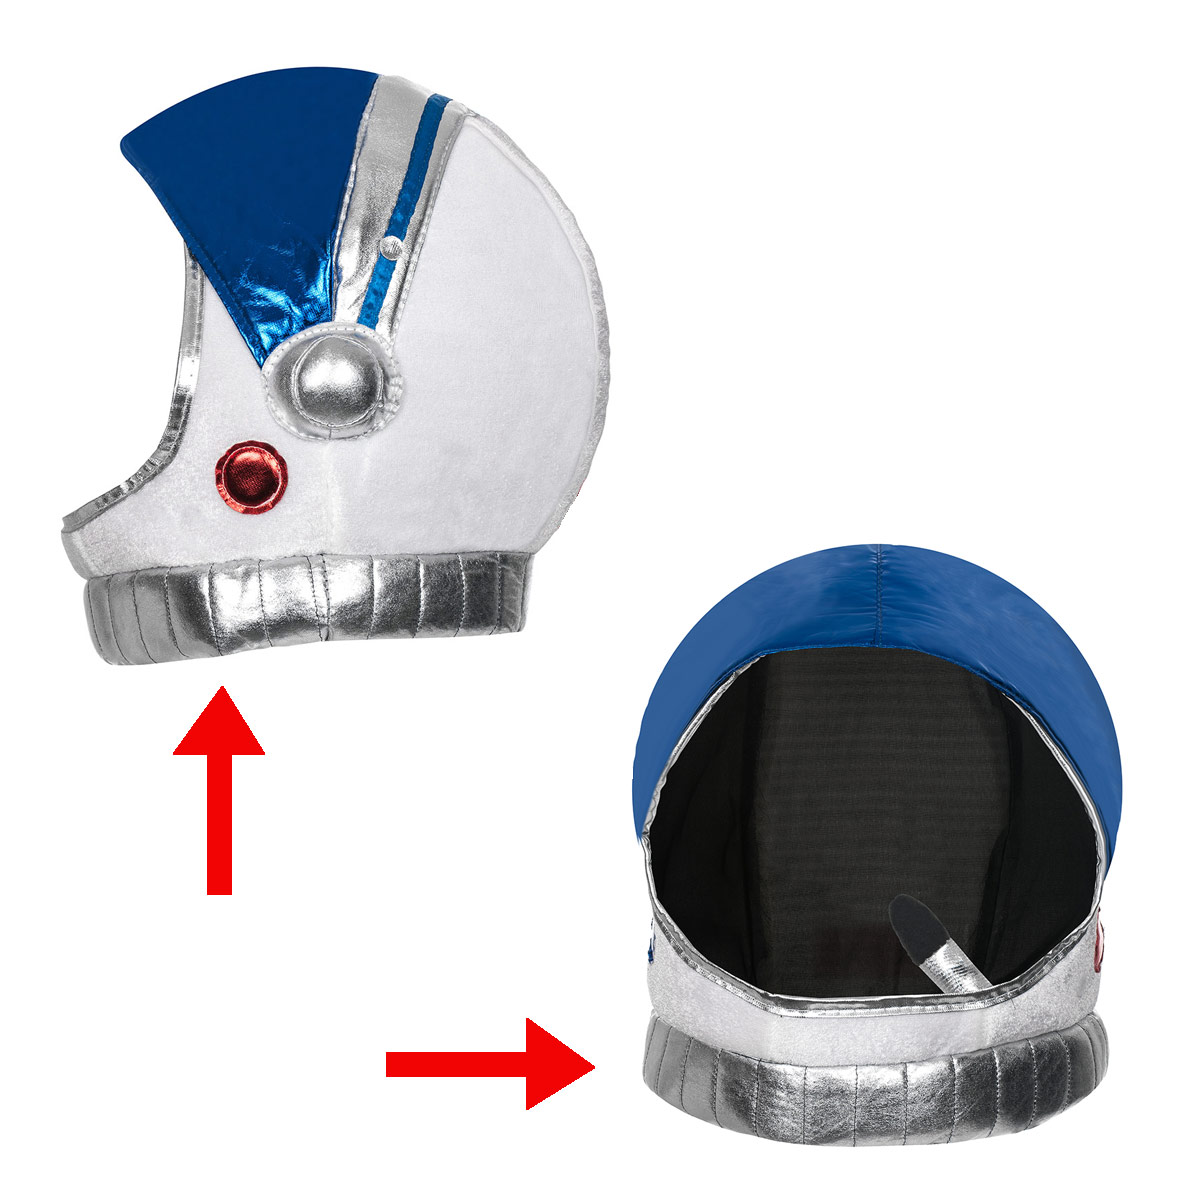 astronautenhelm deluxe kinder kost m accessoire. Black Bedroom Furniture Sets. Home Design Ideas